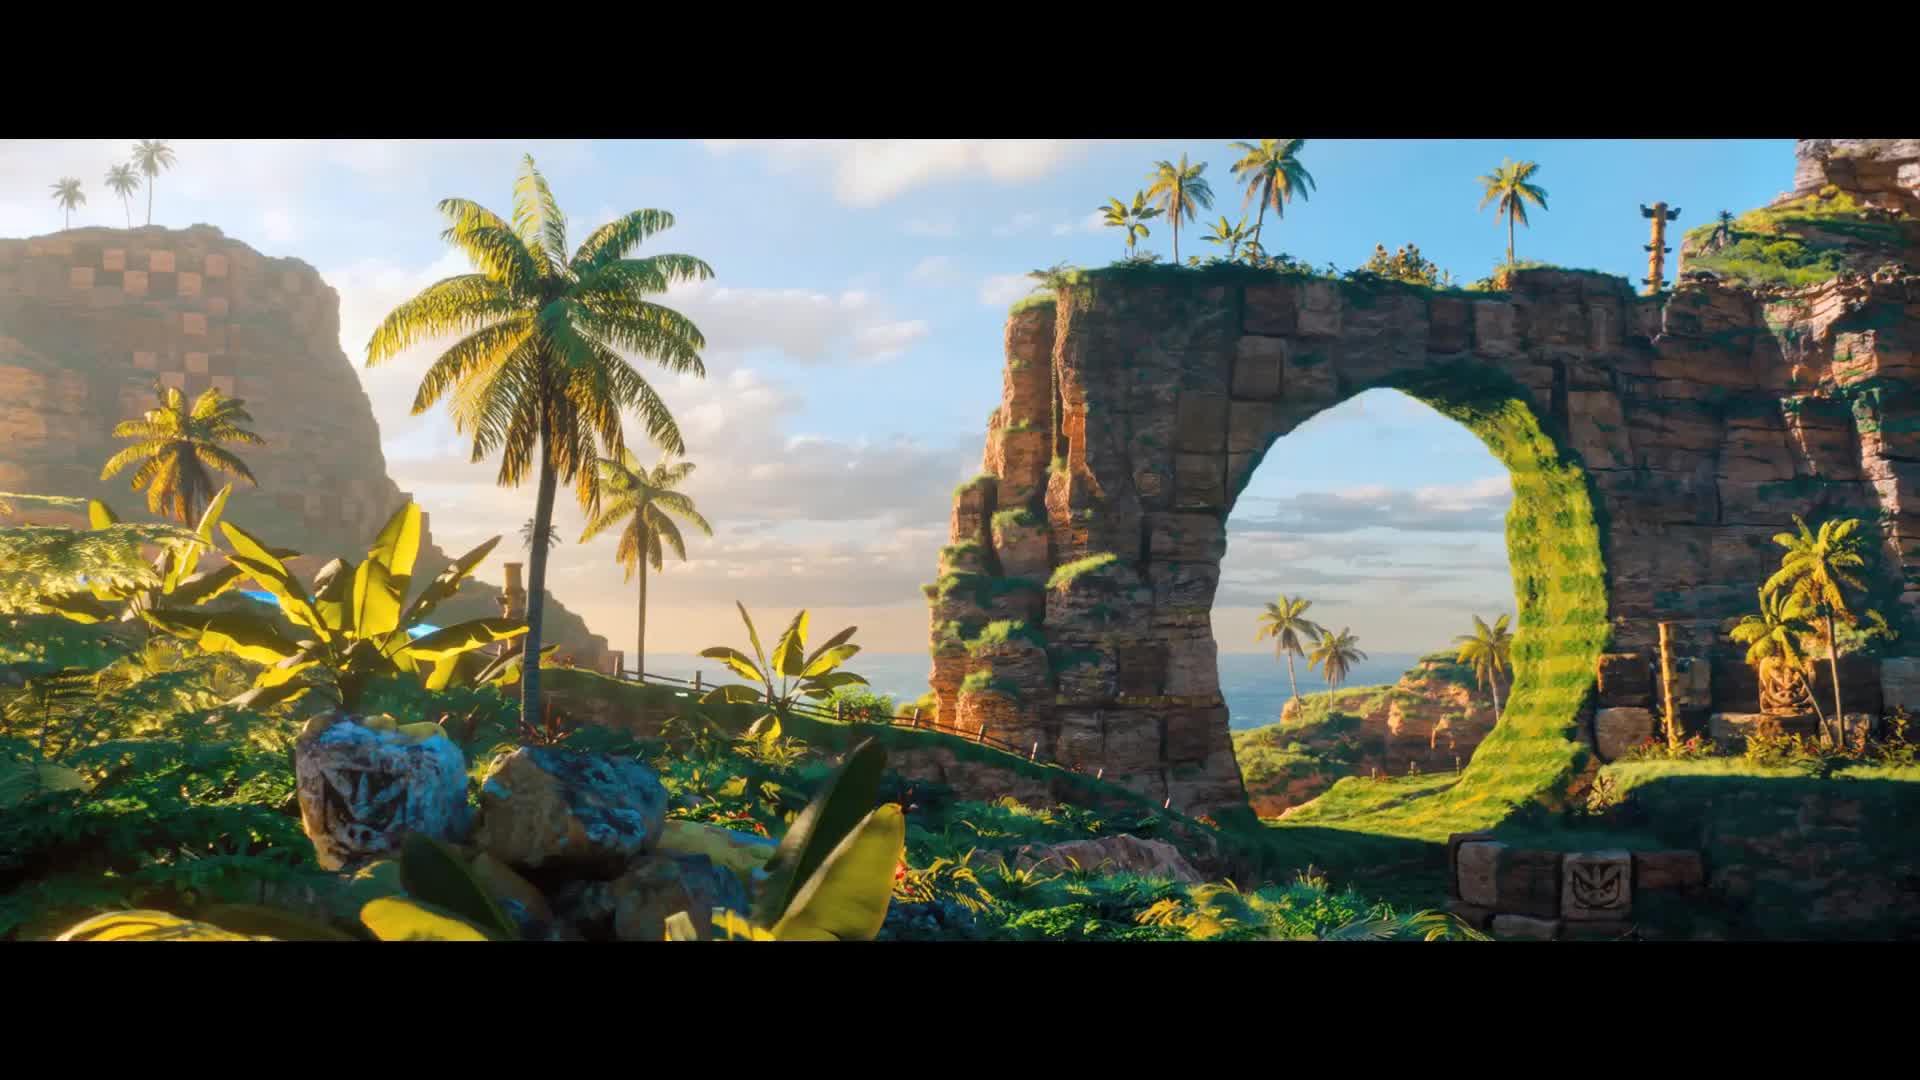 Sonic the Hedgehog - International Trailer #1 [HD] screen capture